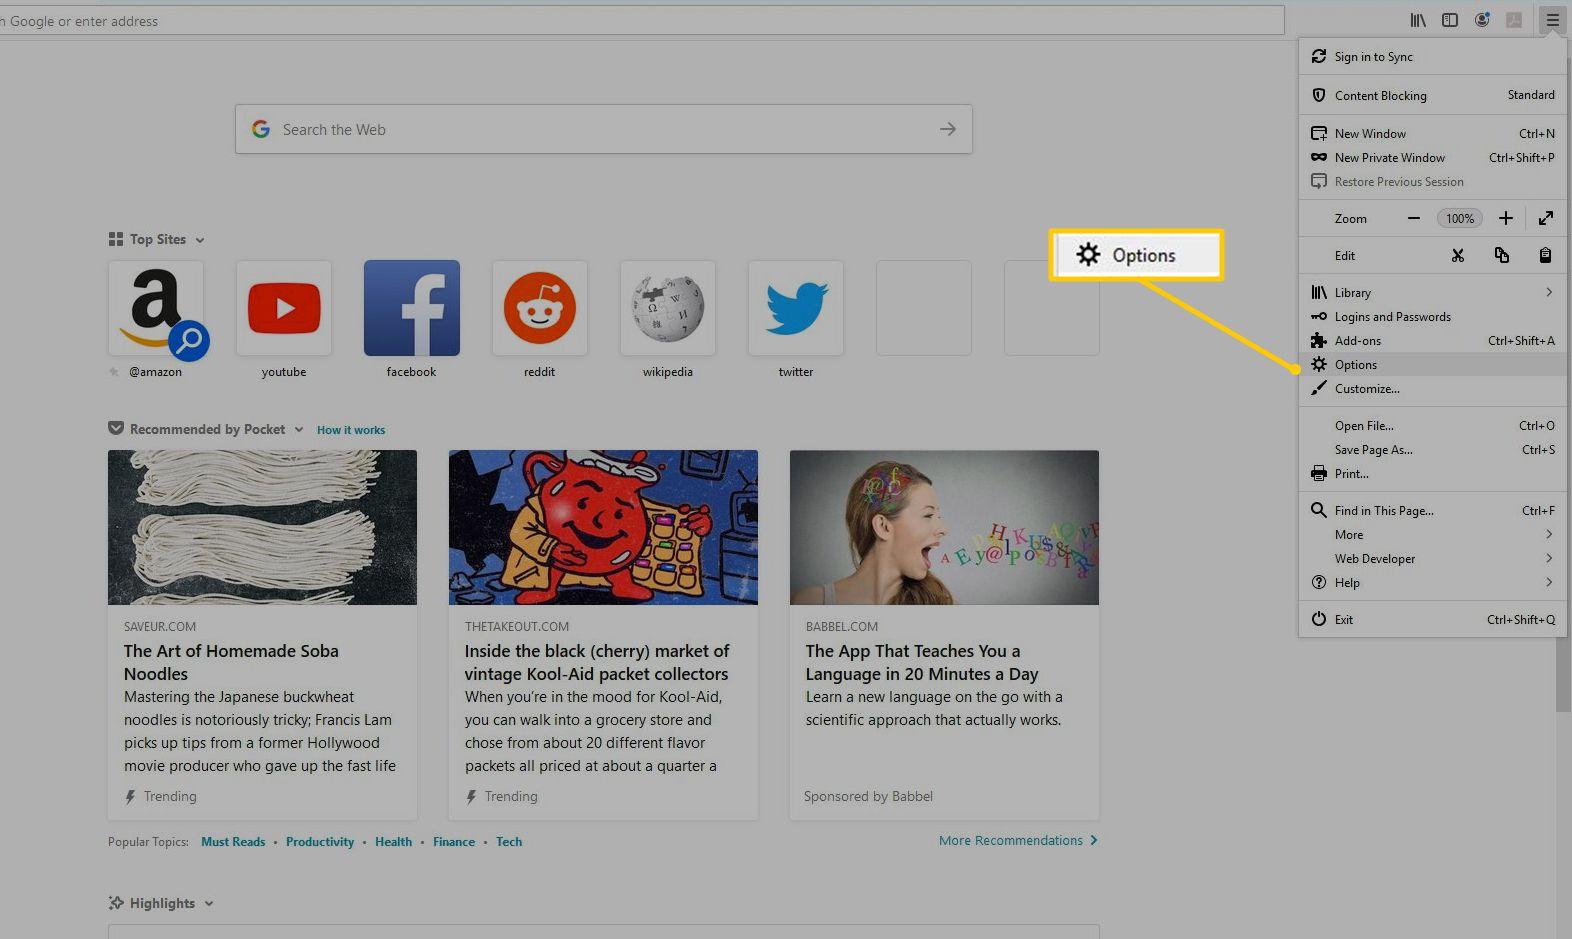 Options menu item in Firefox